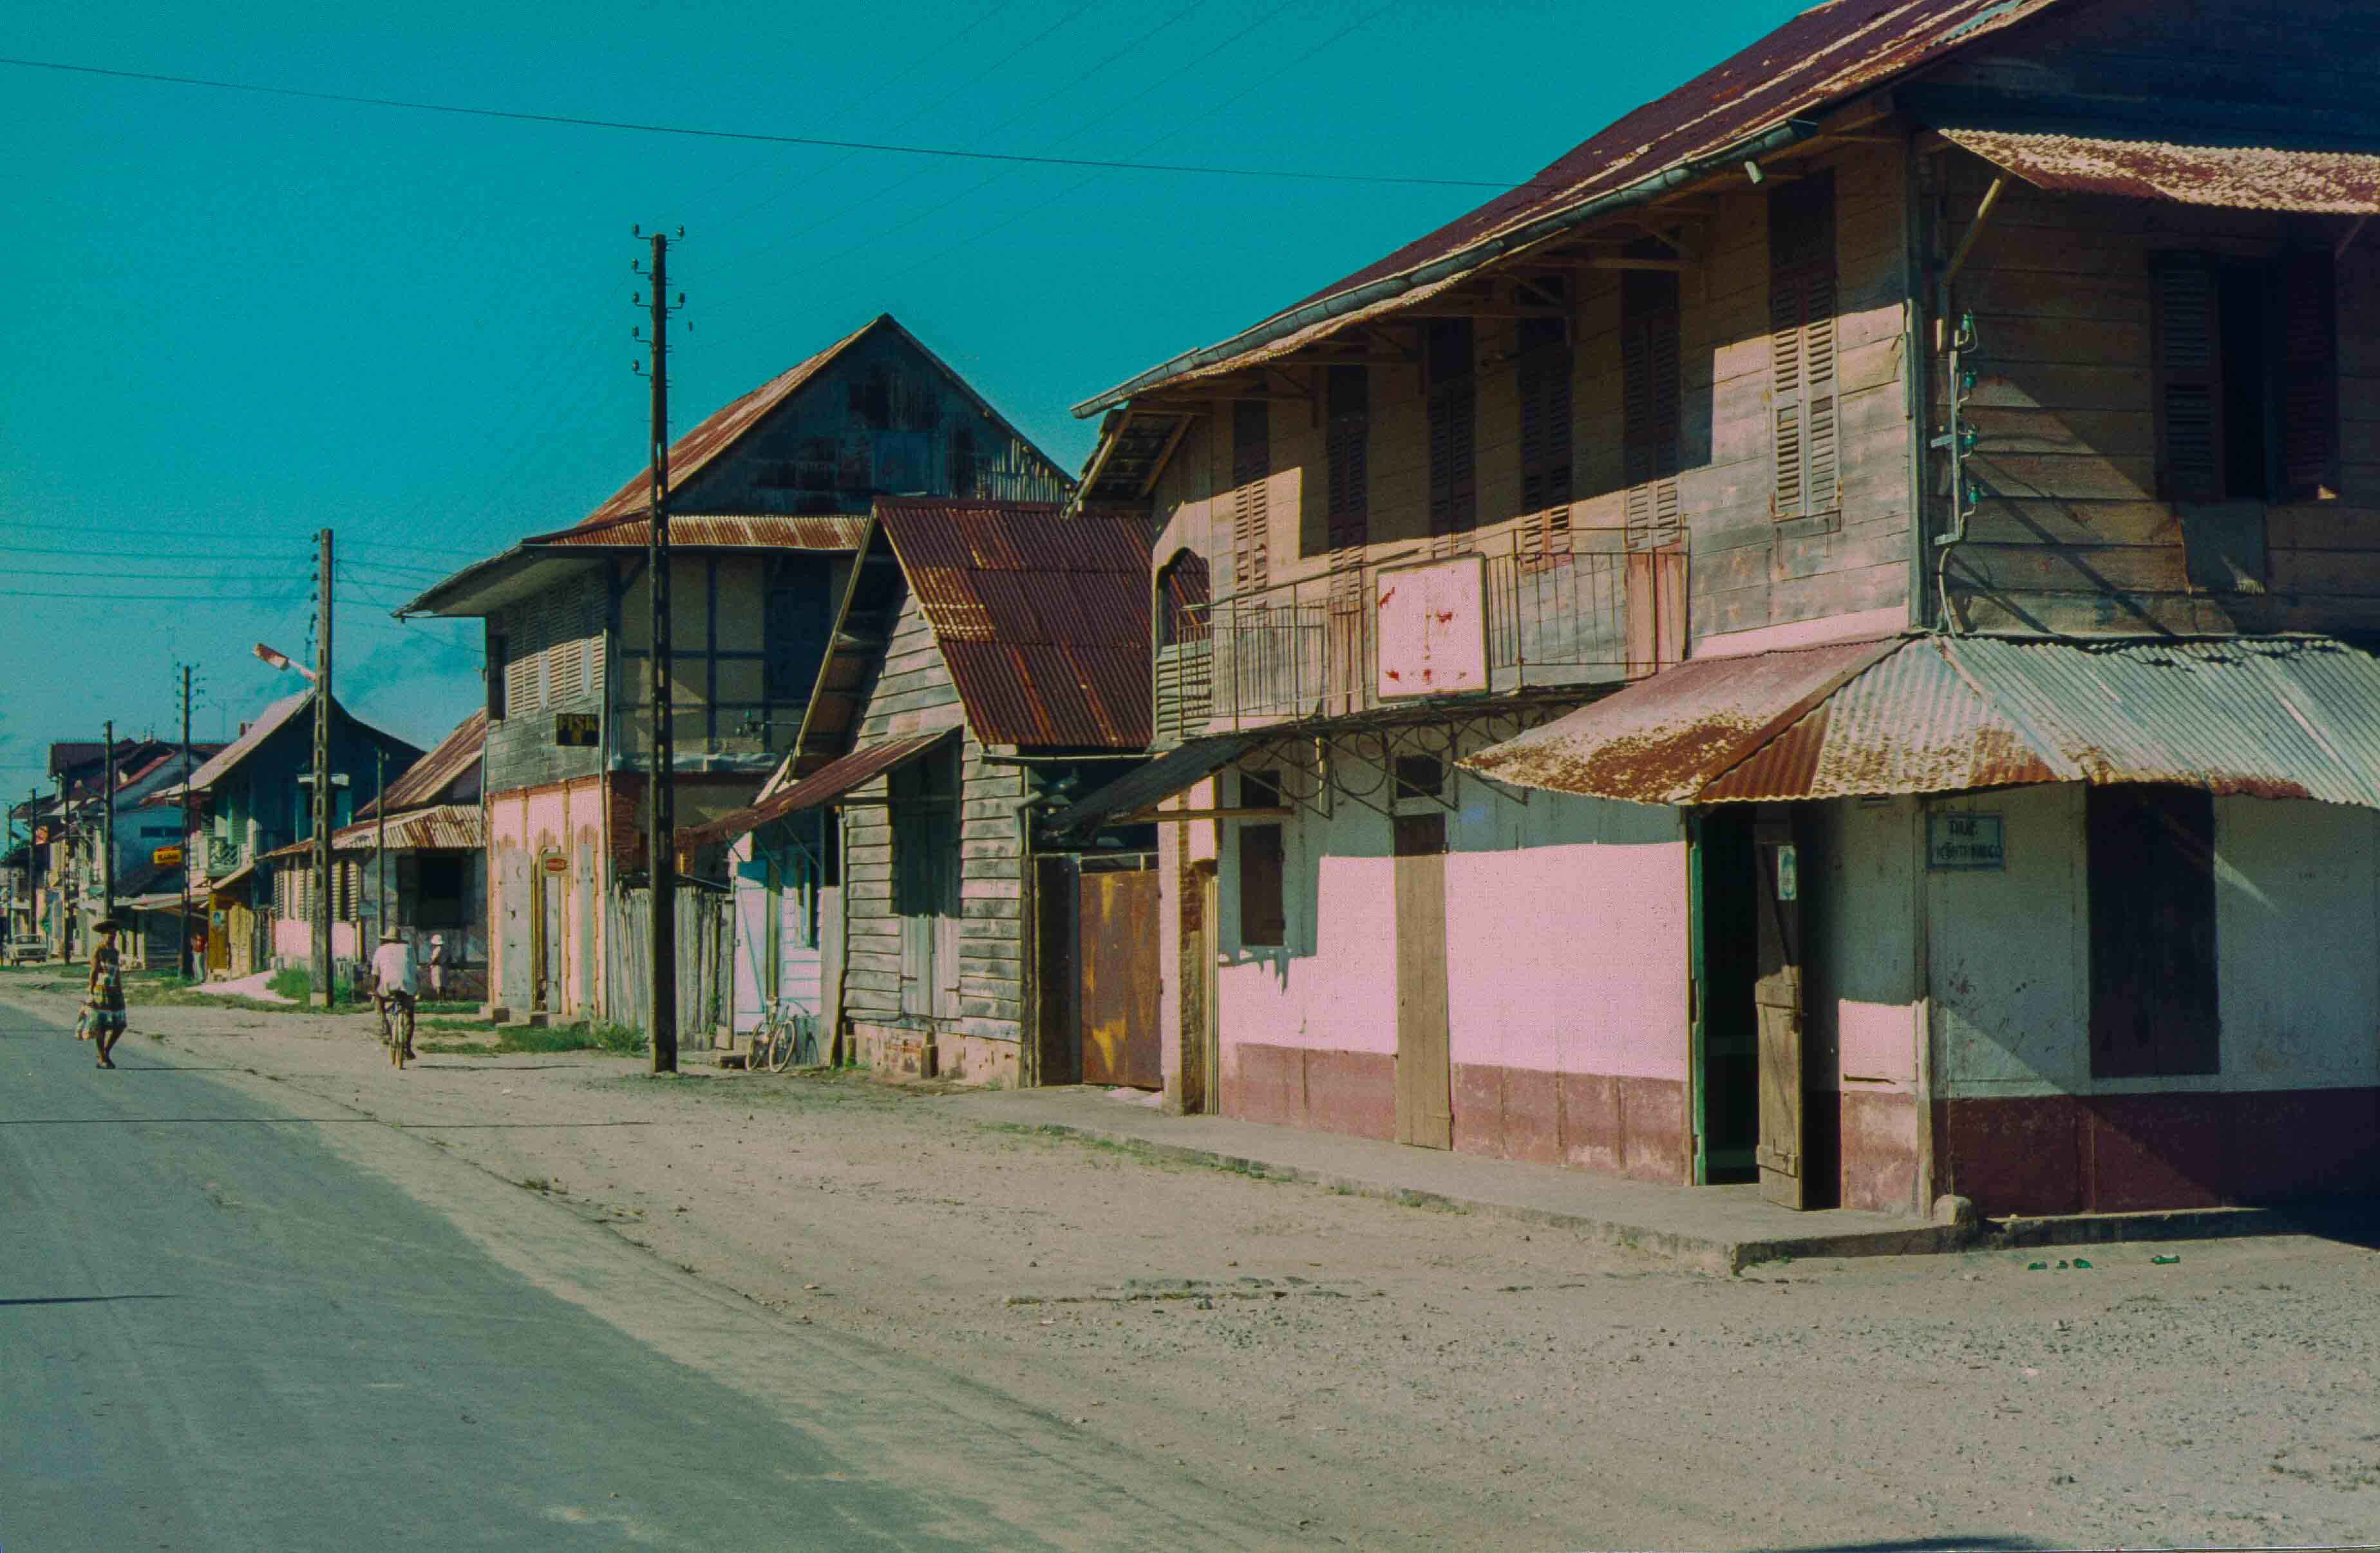 431. Suriname